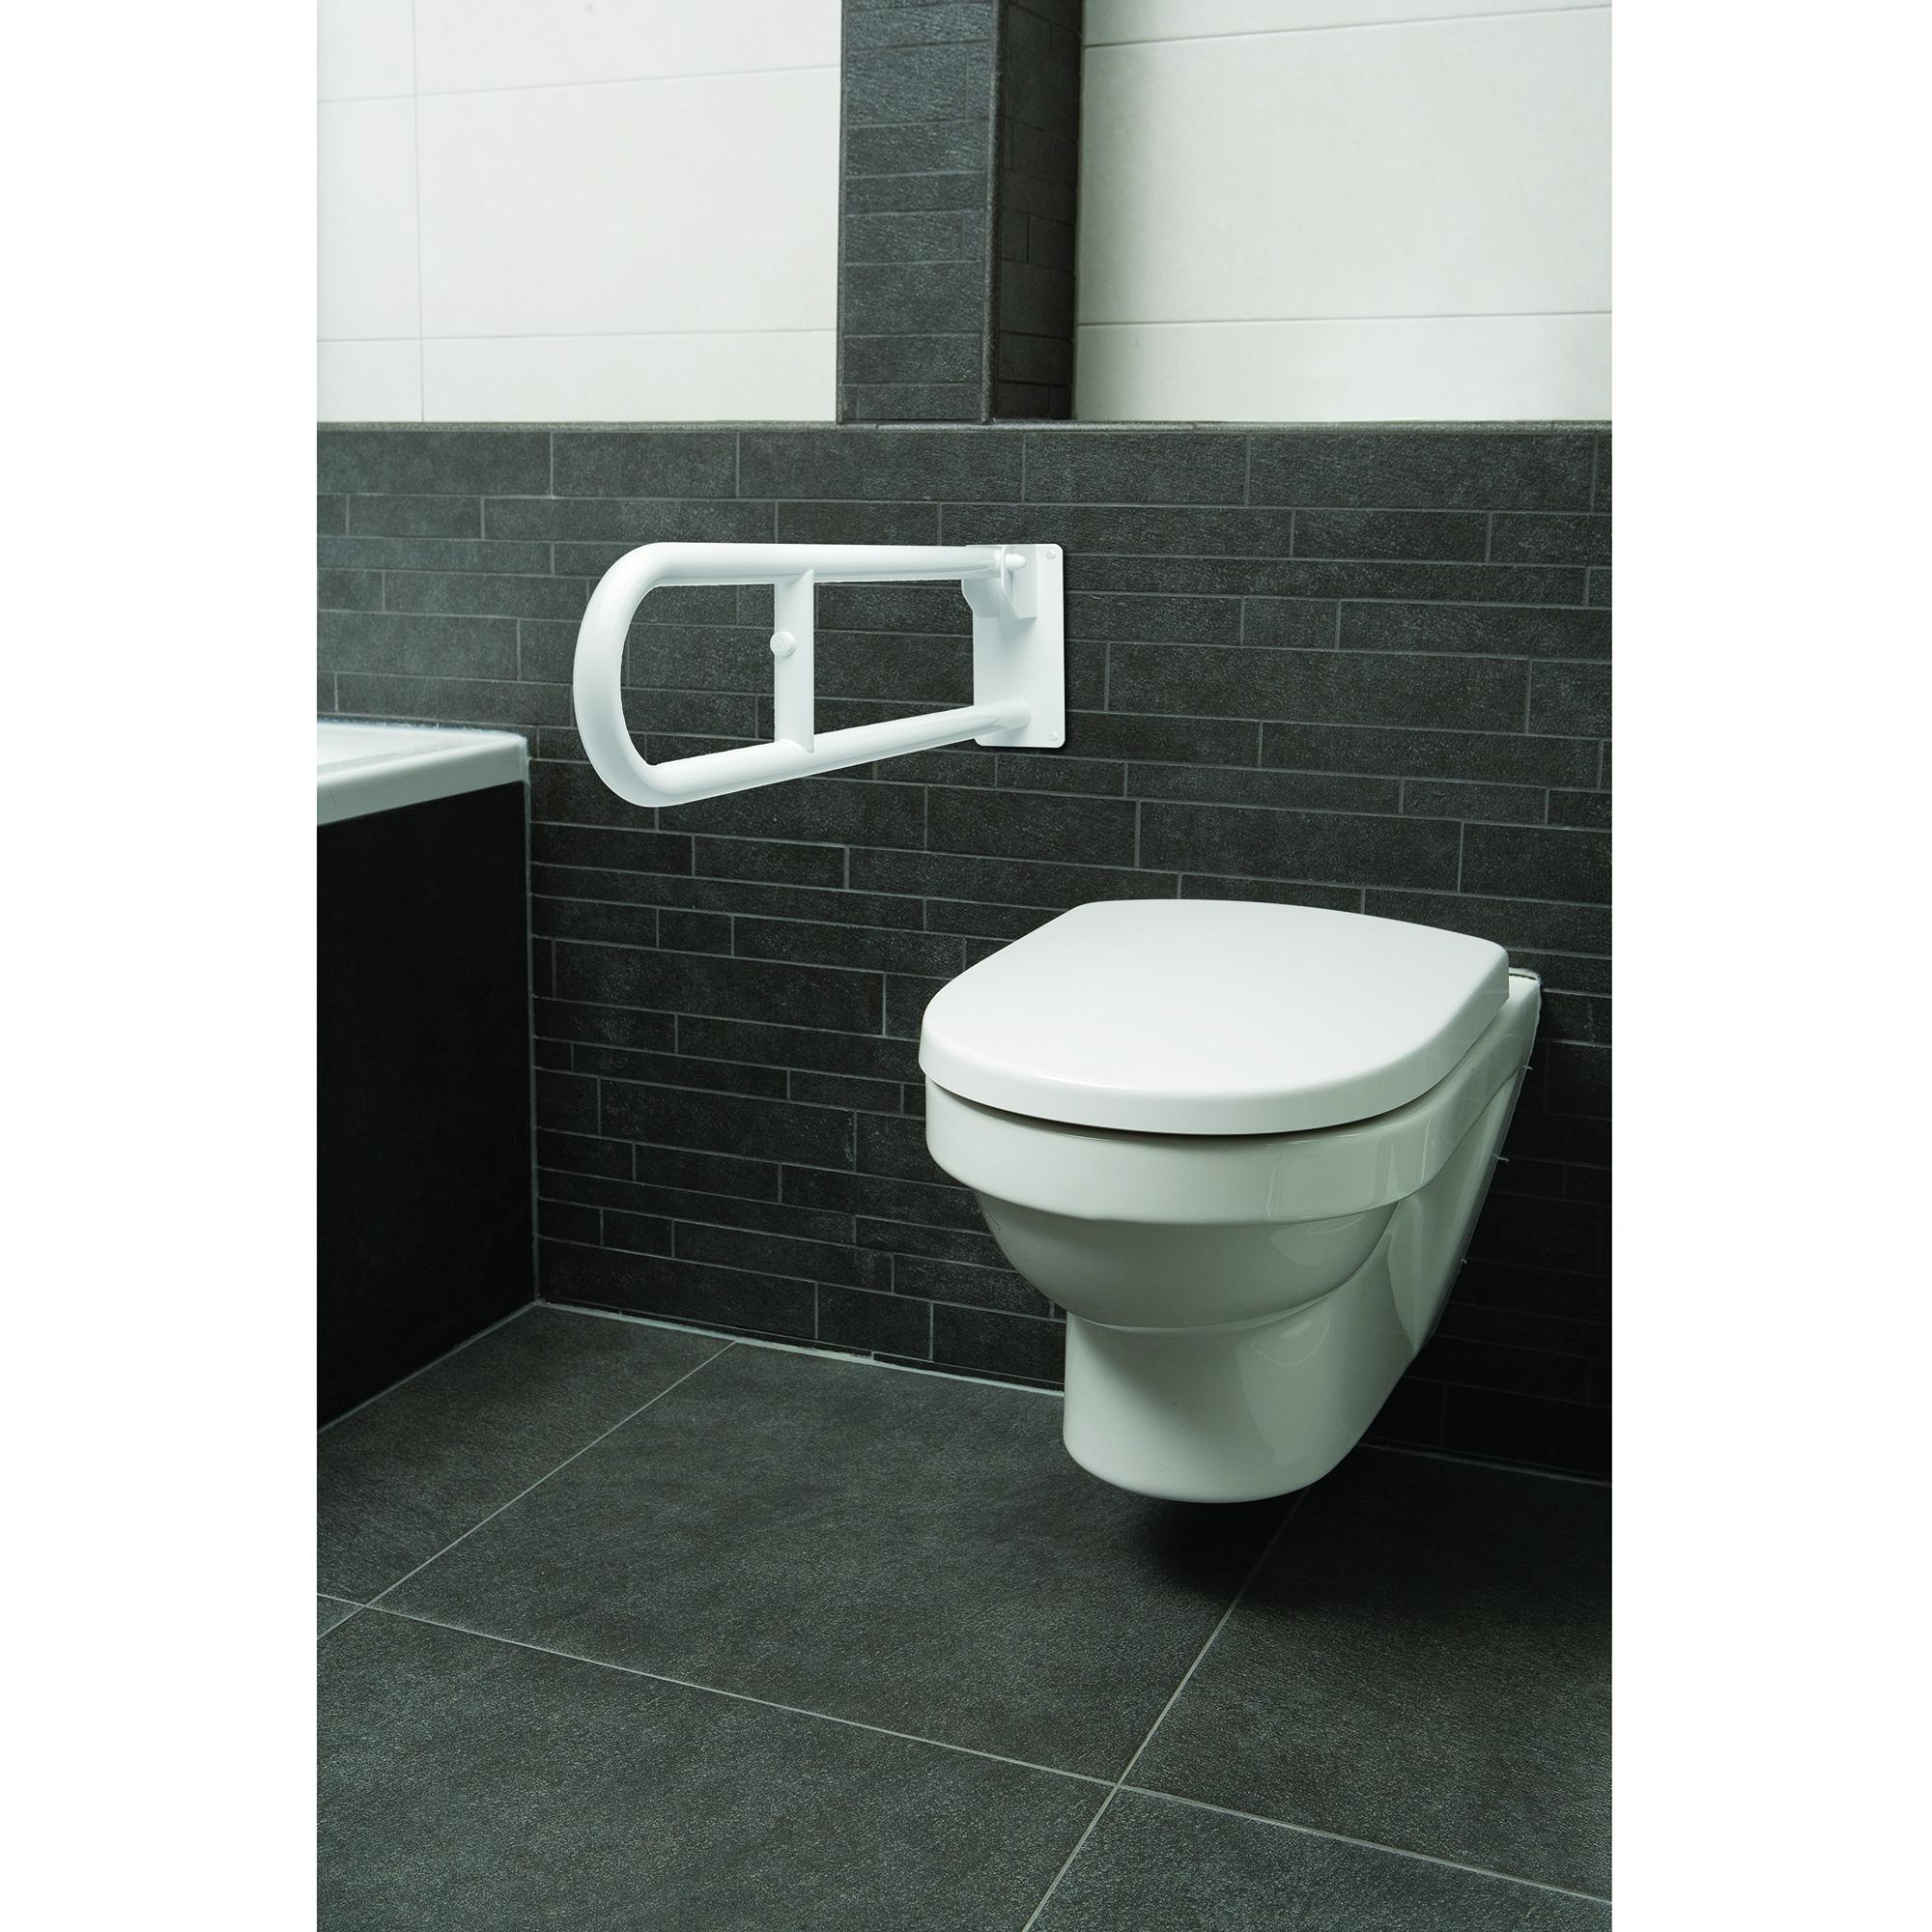 Toiletbeugel Wit Secucare Opklapbaar 600 Mm